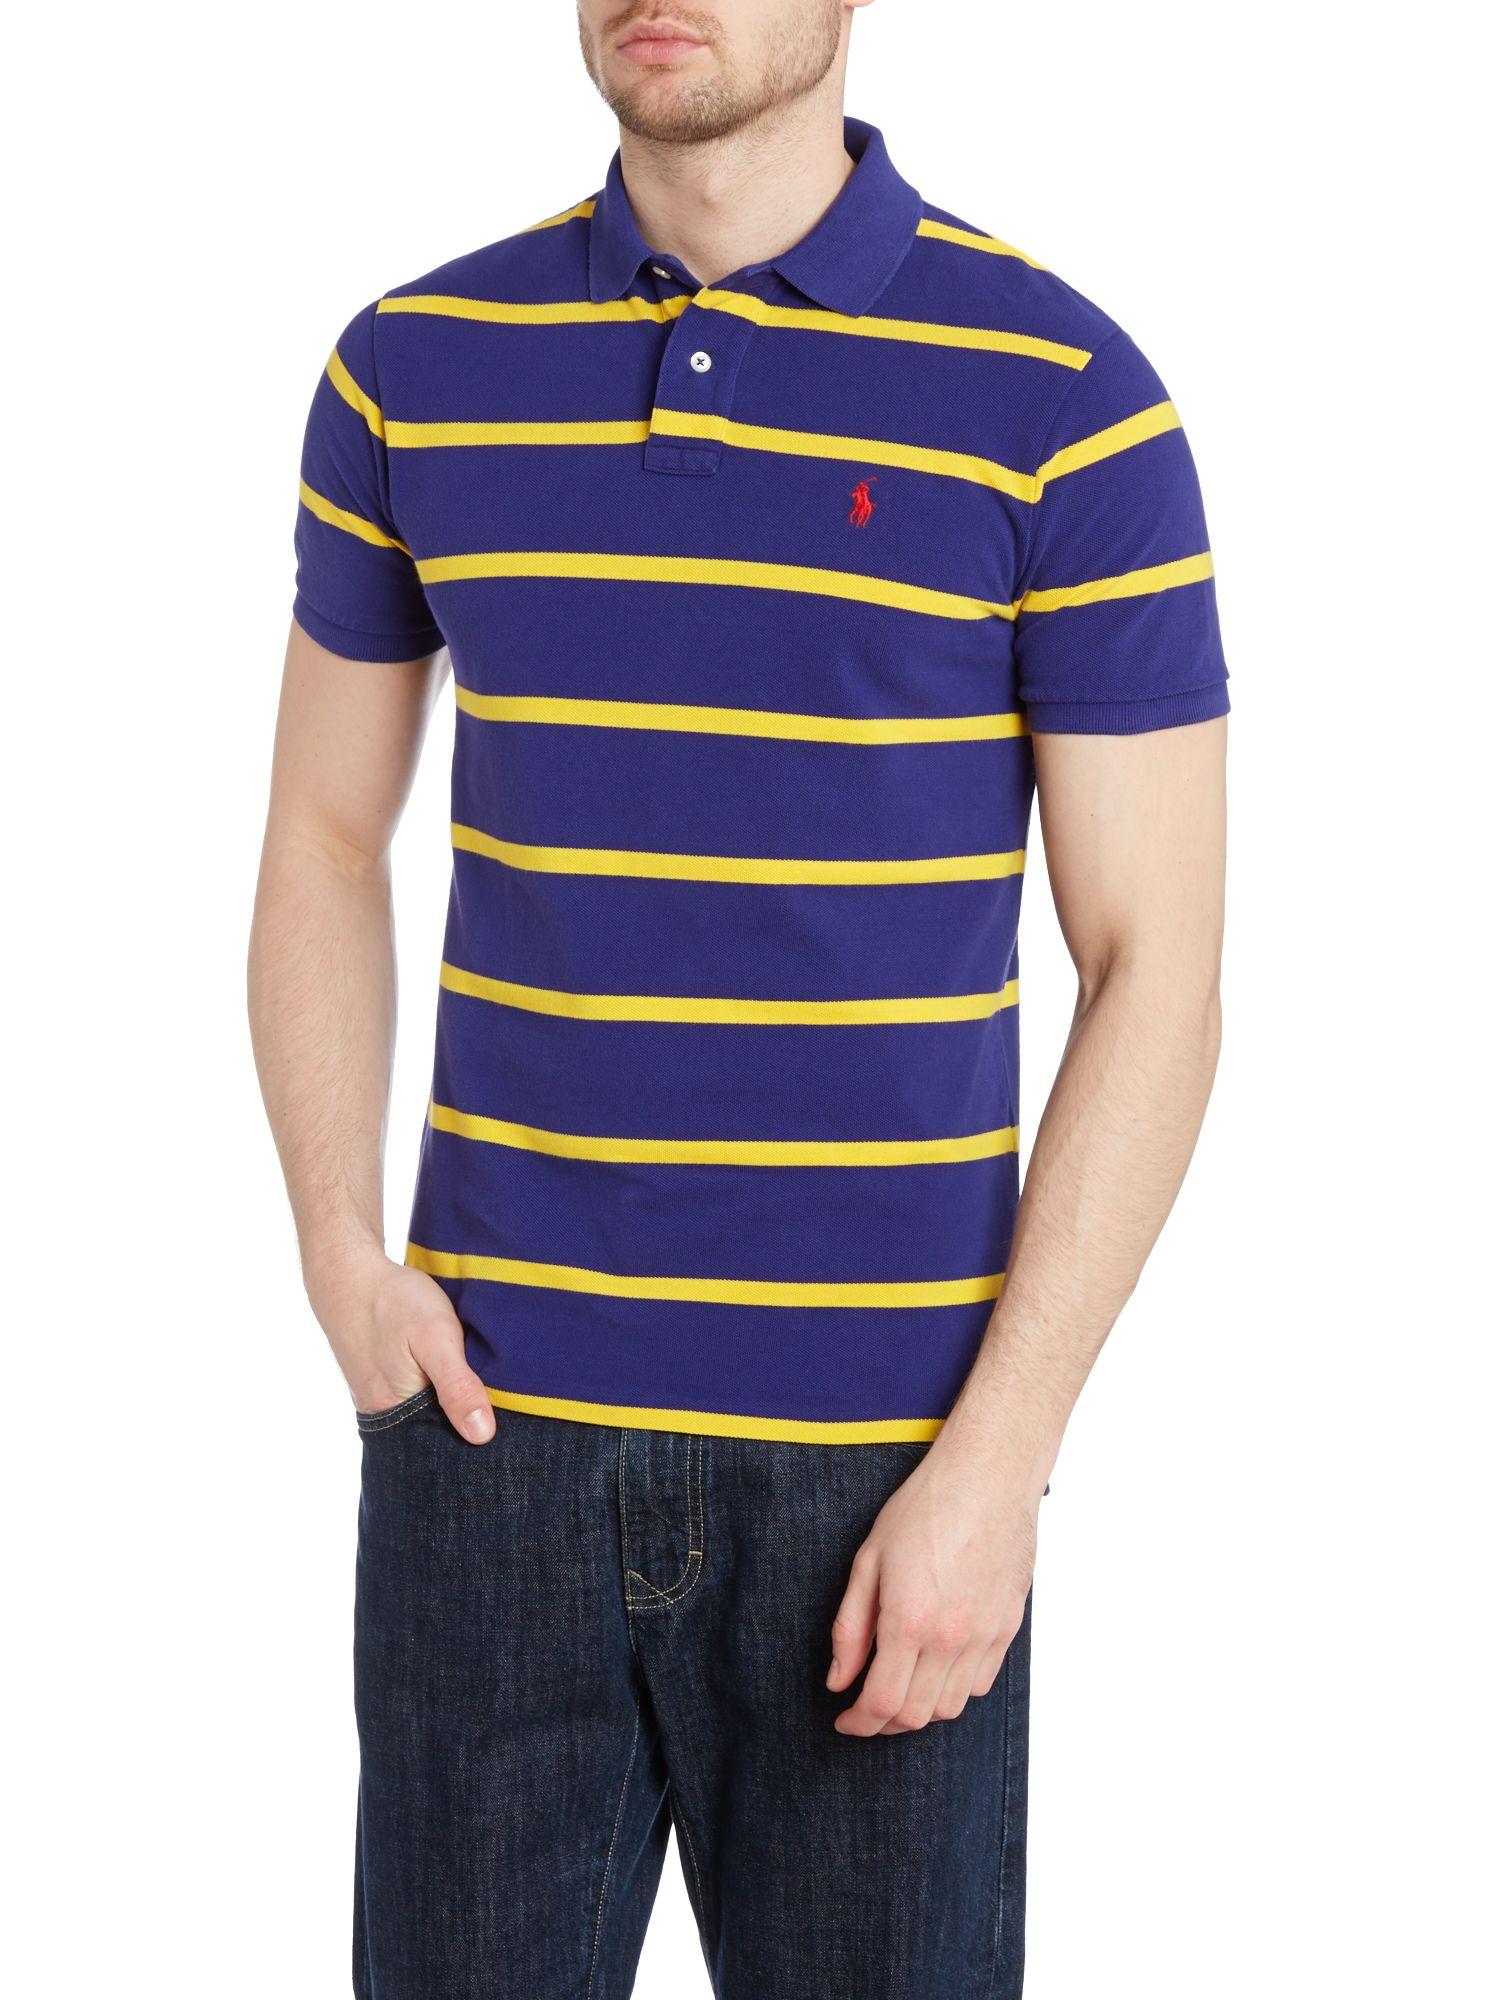 Polo Ralph Lauren Custom Fit Short Sleeve Stripe Polo